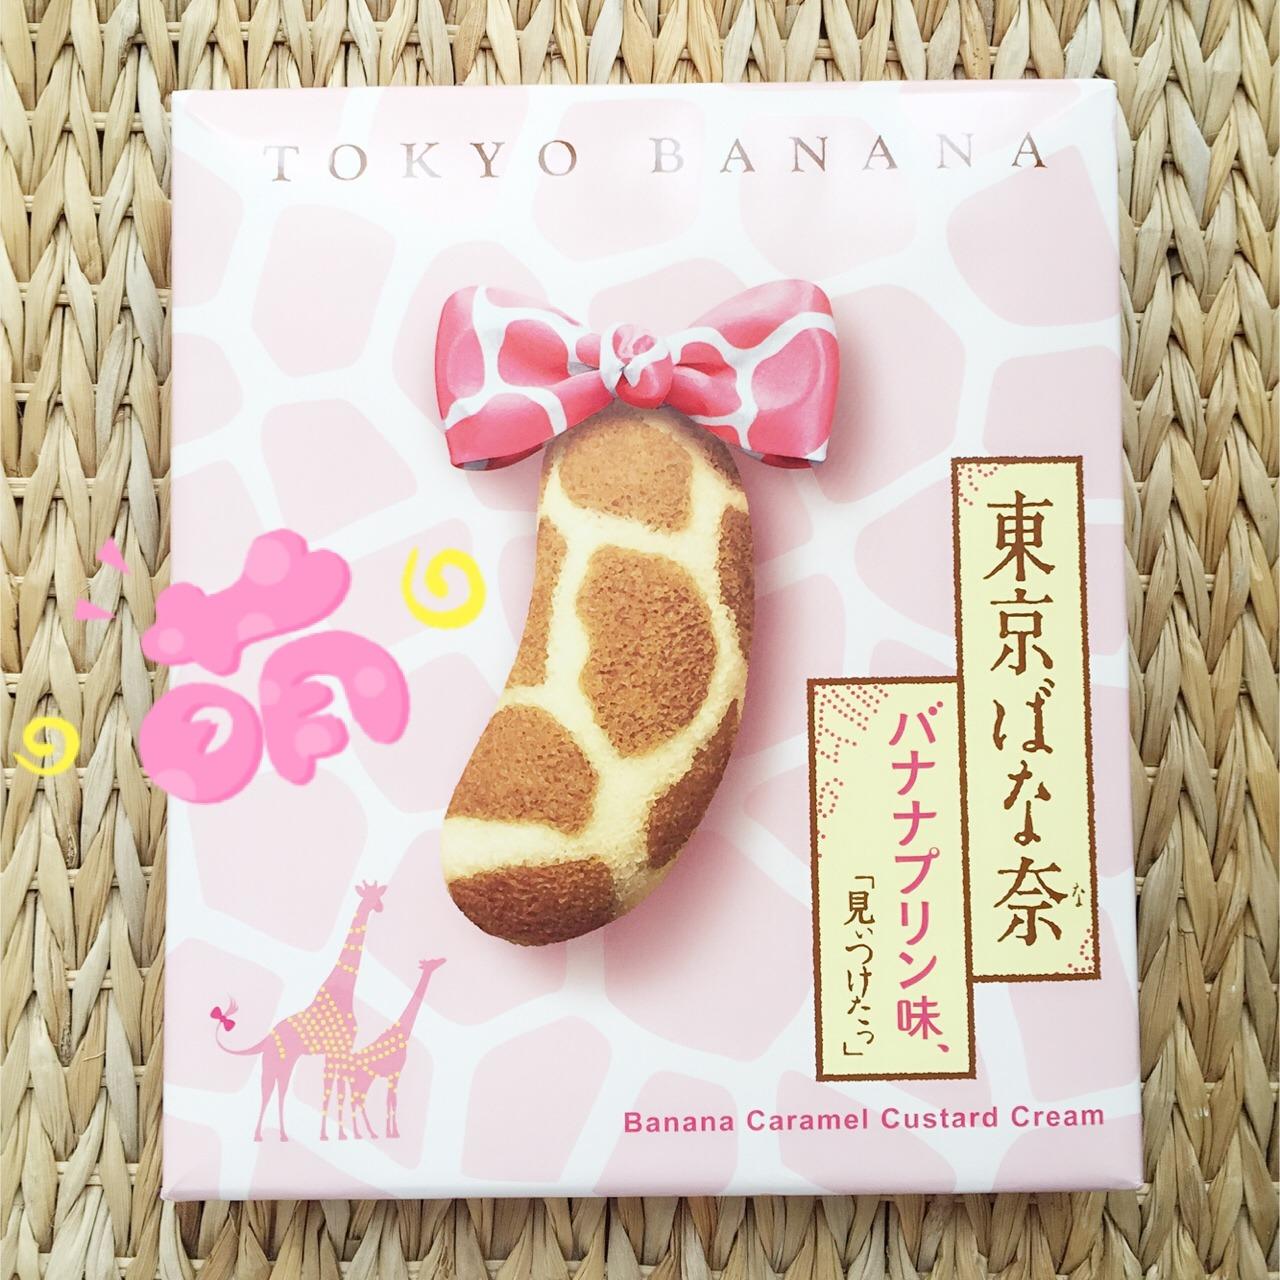 tokyo banana 豹纹蛋糕